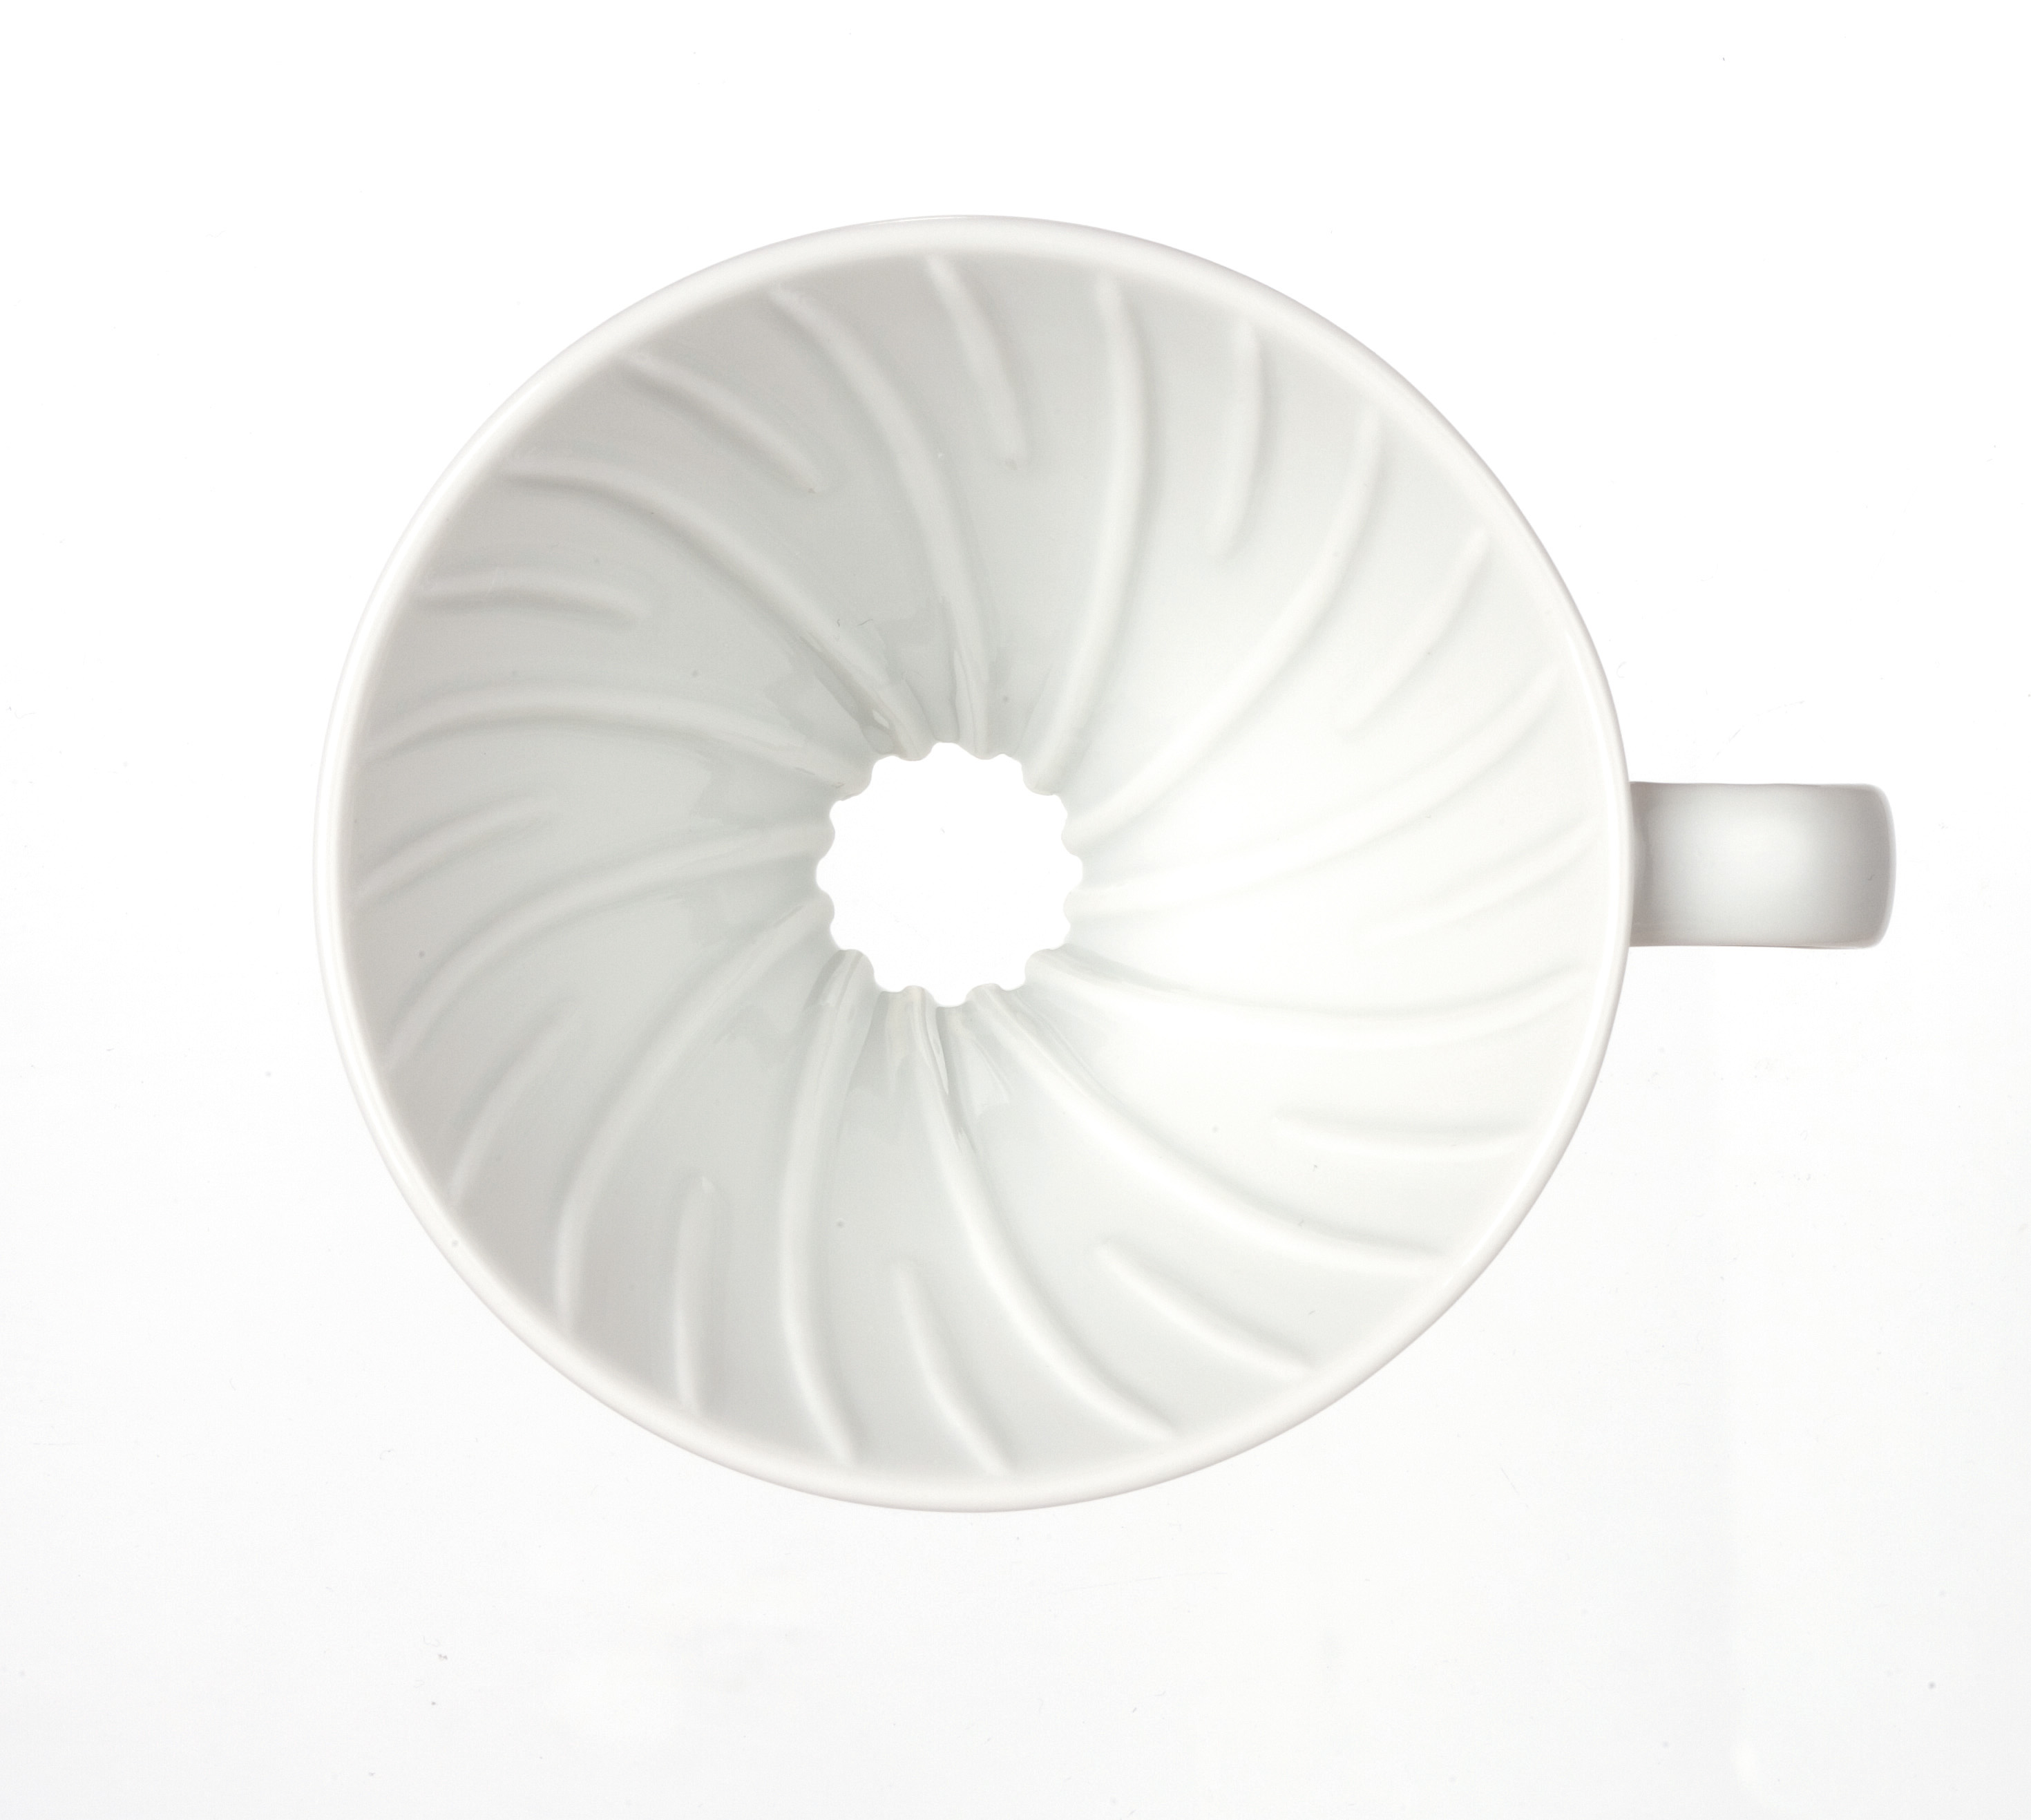 Hario V60 02 Beyaz Seramik Dripper